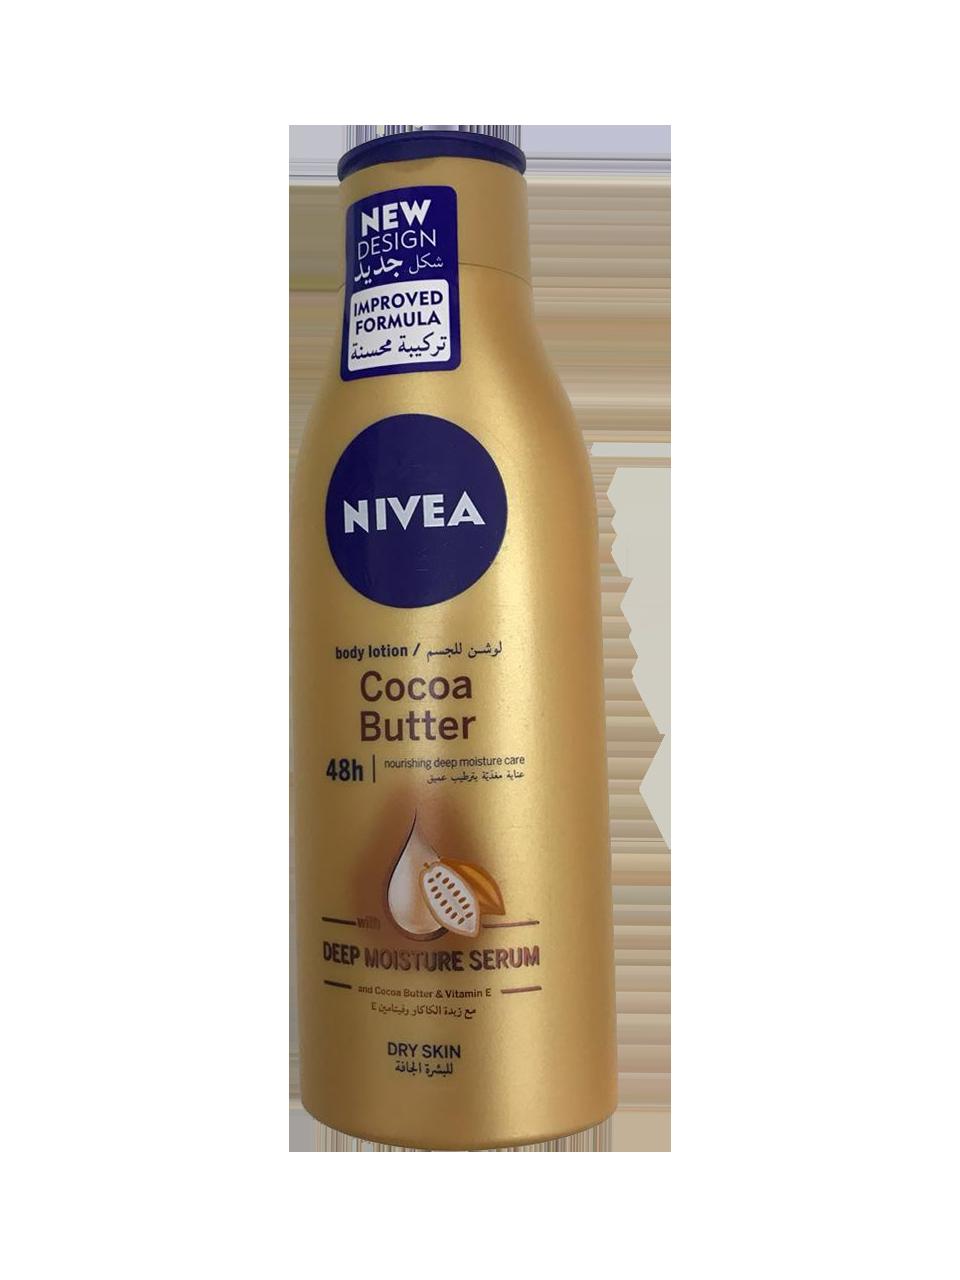 Nivea Cocoa Butter Deep Moisture 48H 250ml